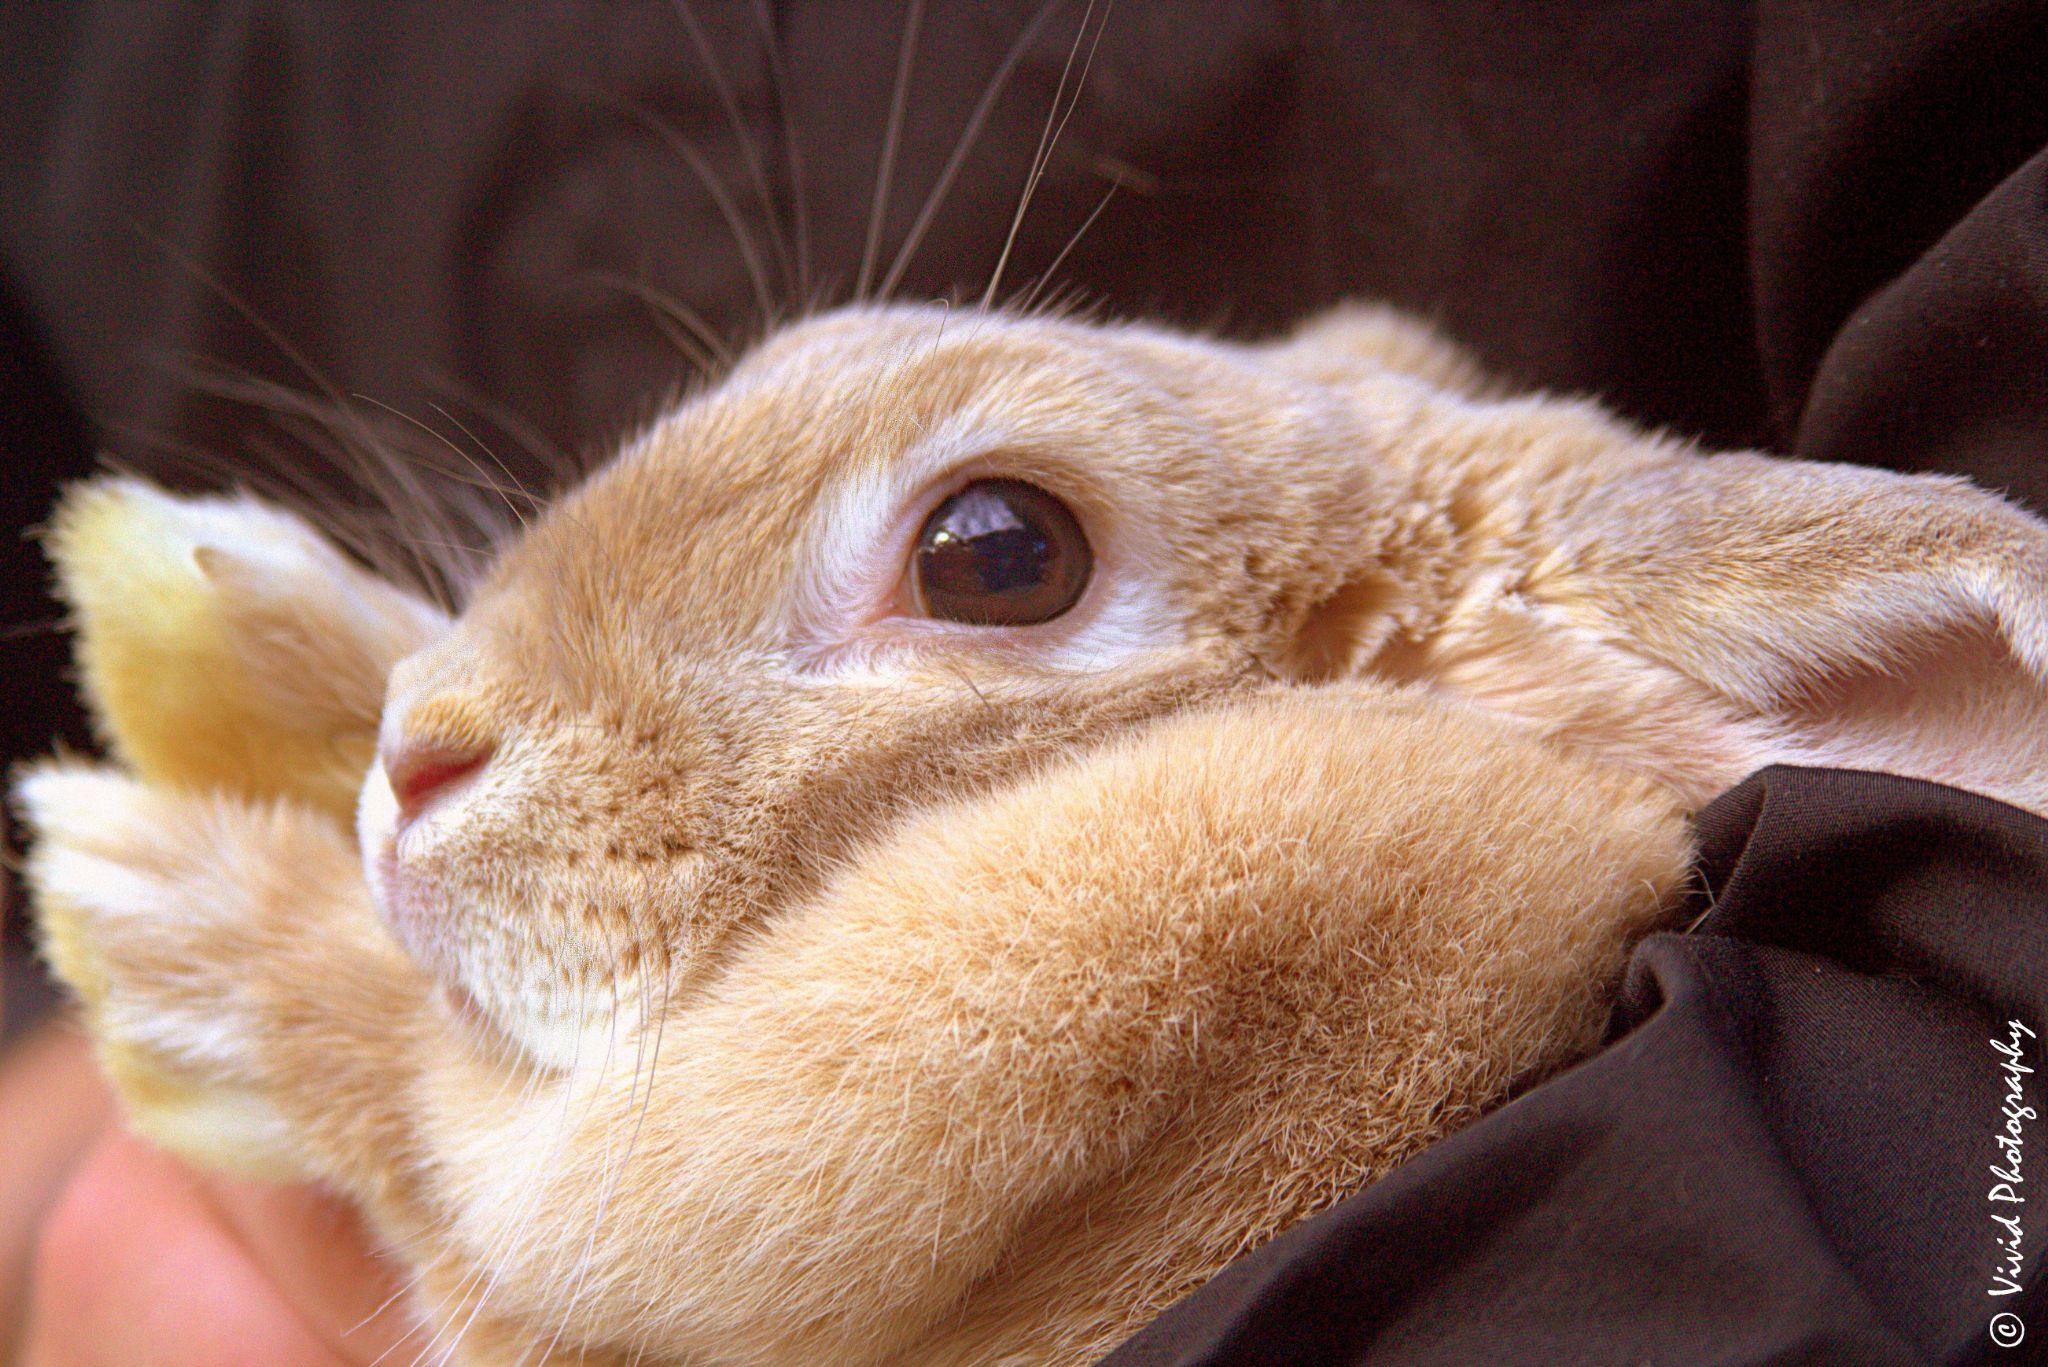 Snuggle Bunny by Judee Schofield